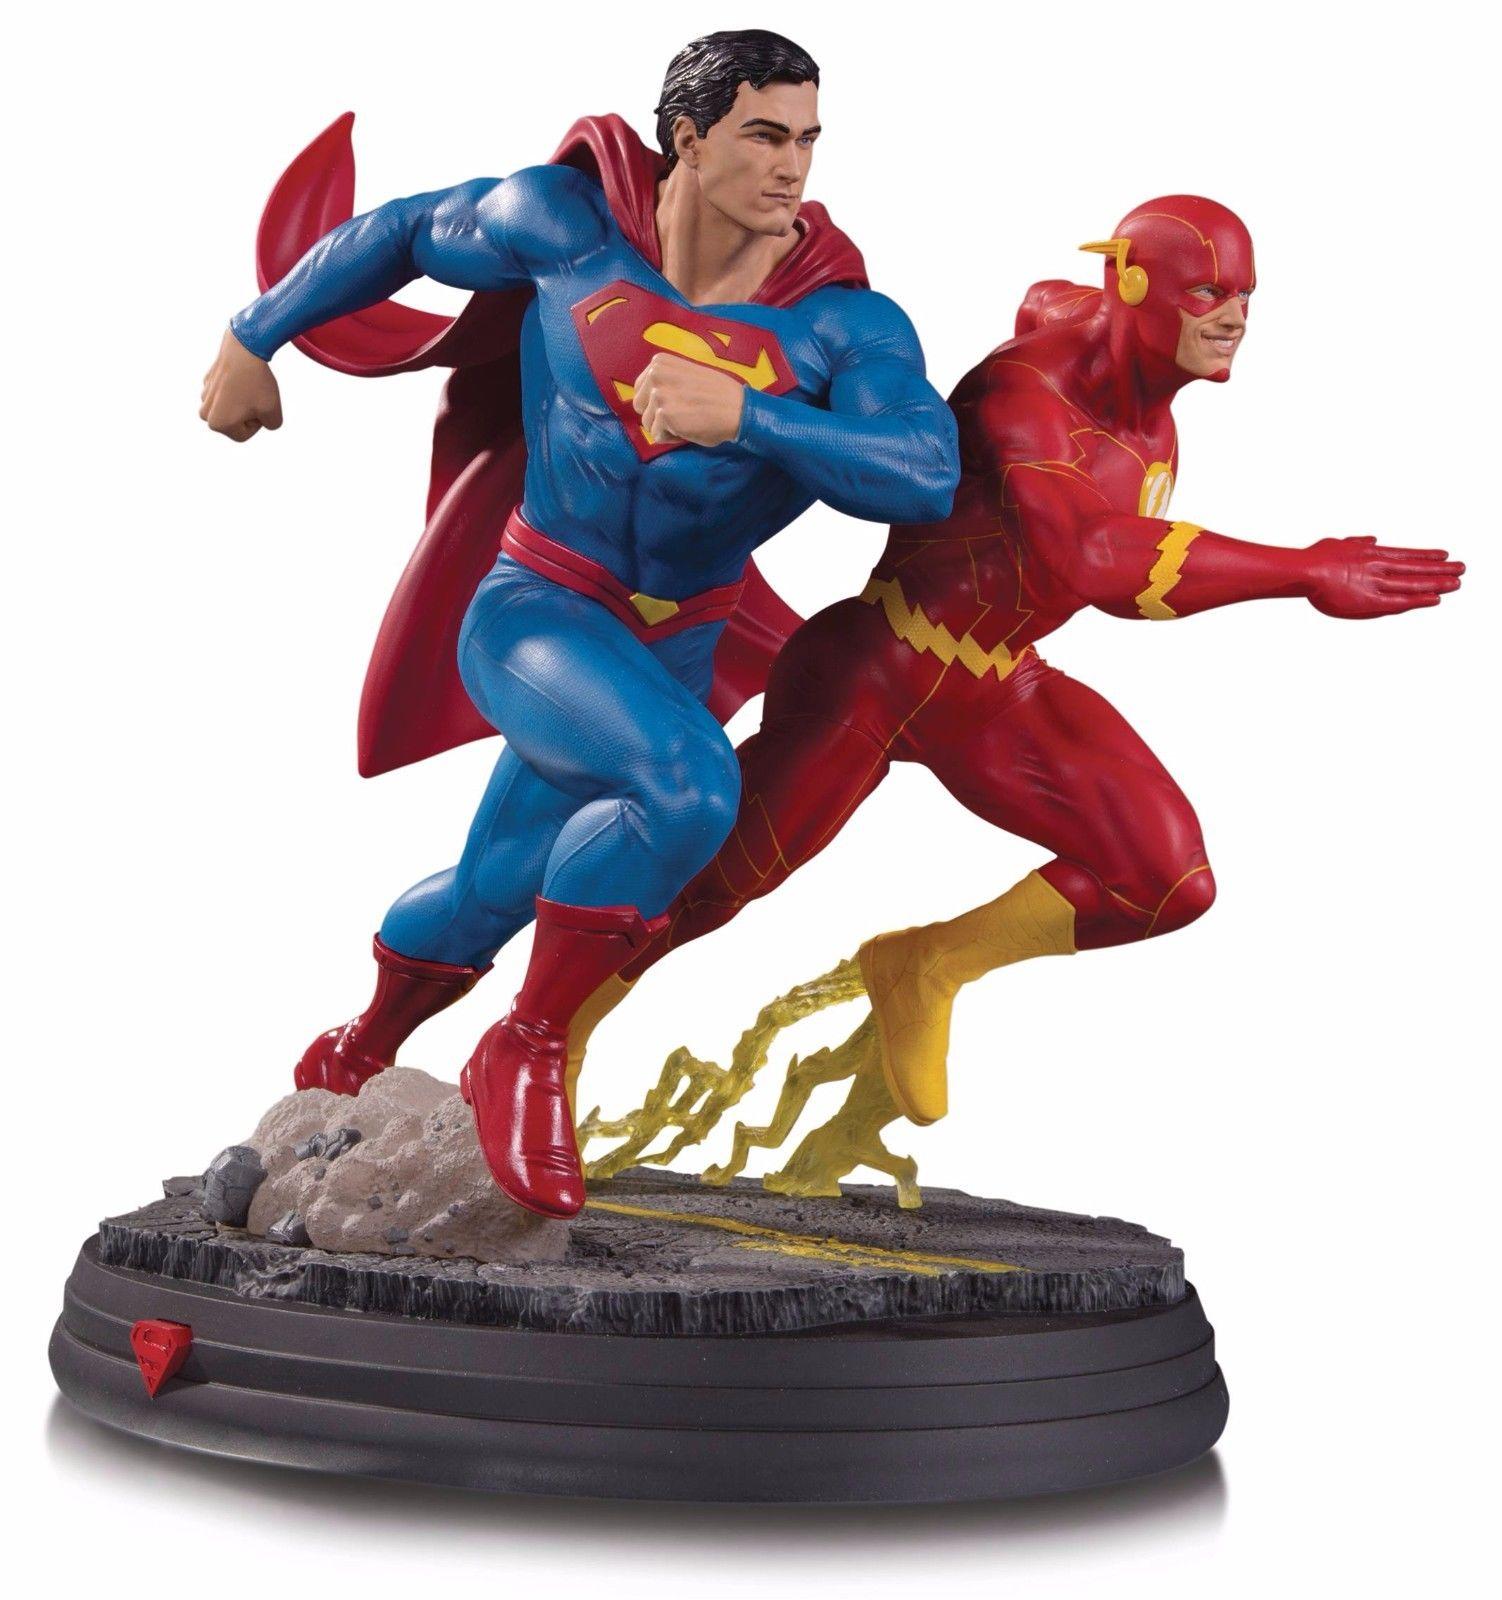 DC GALLERY SUPERMAN VS FLASH RACING STATUE PRE SALE